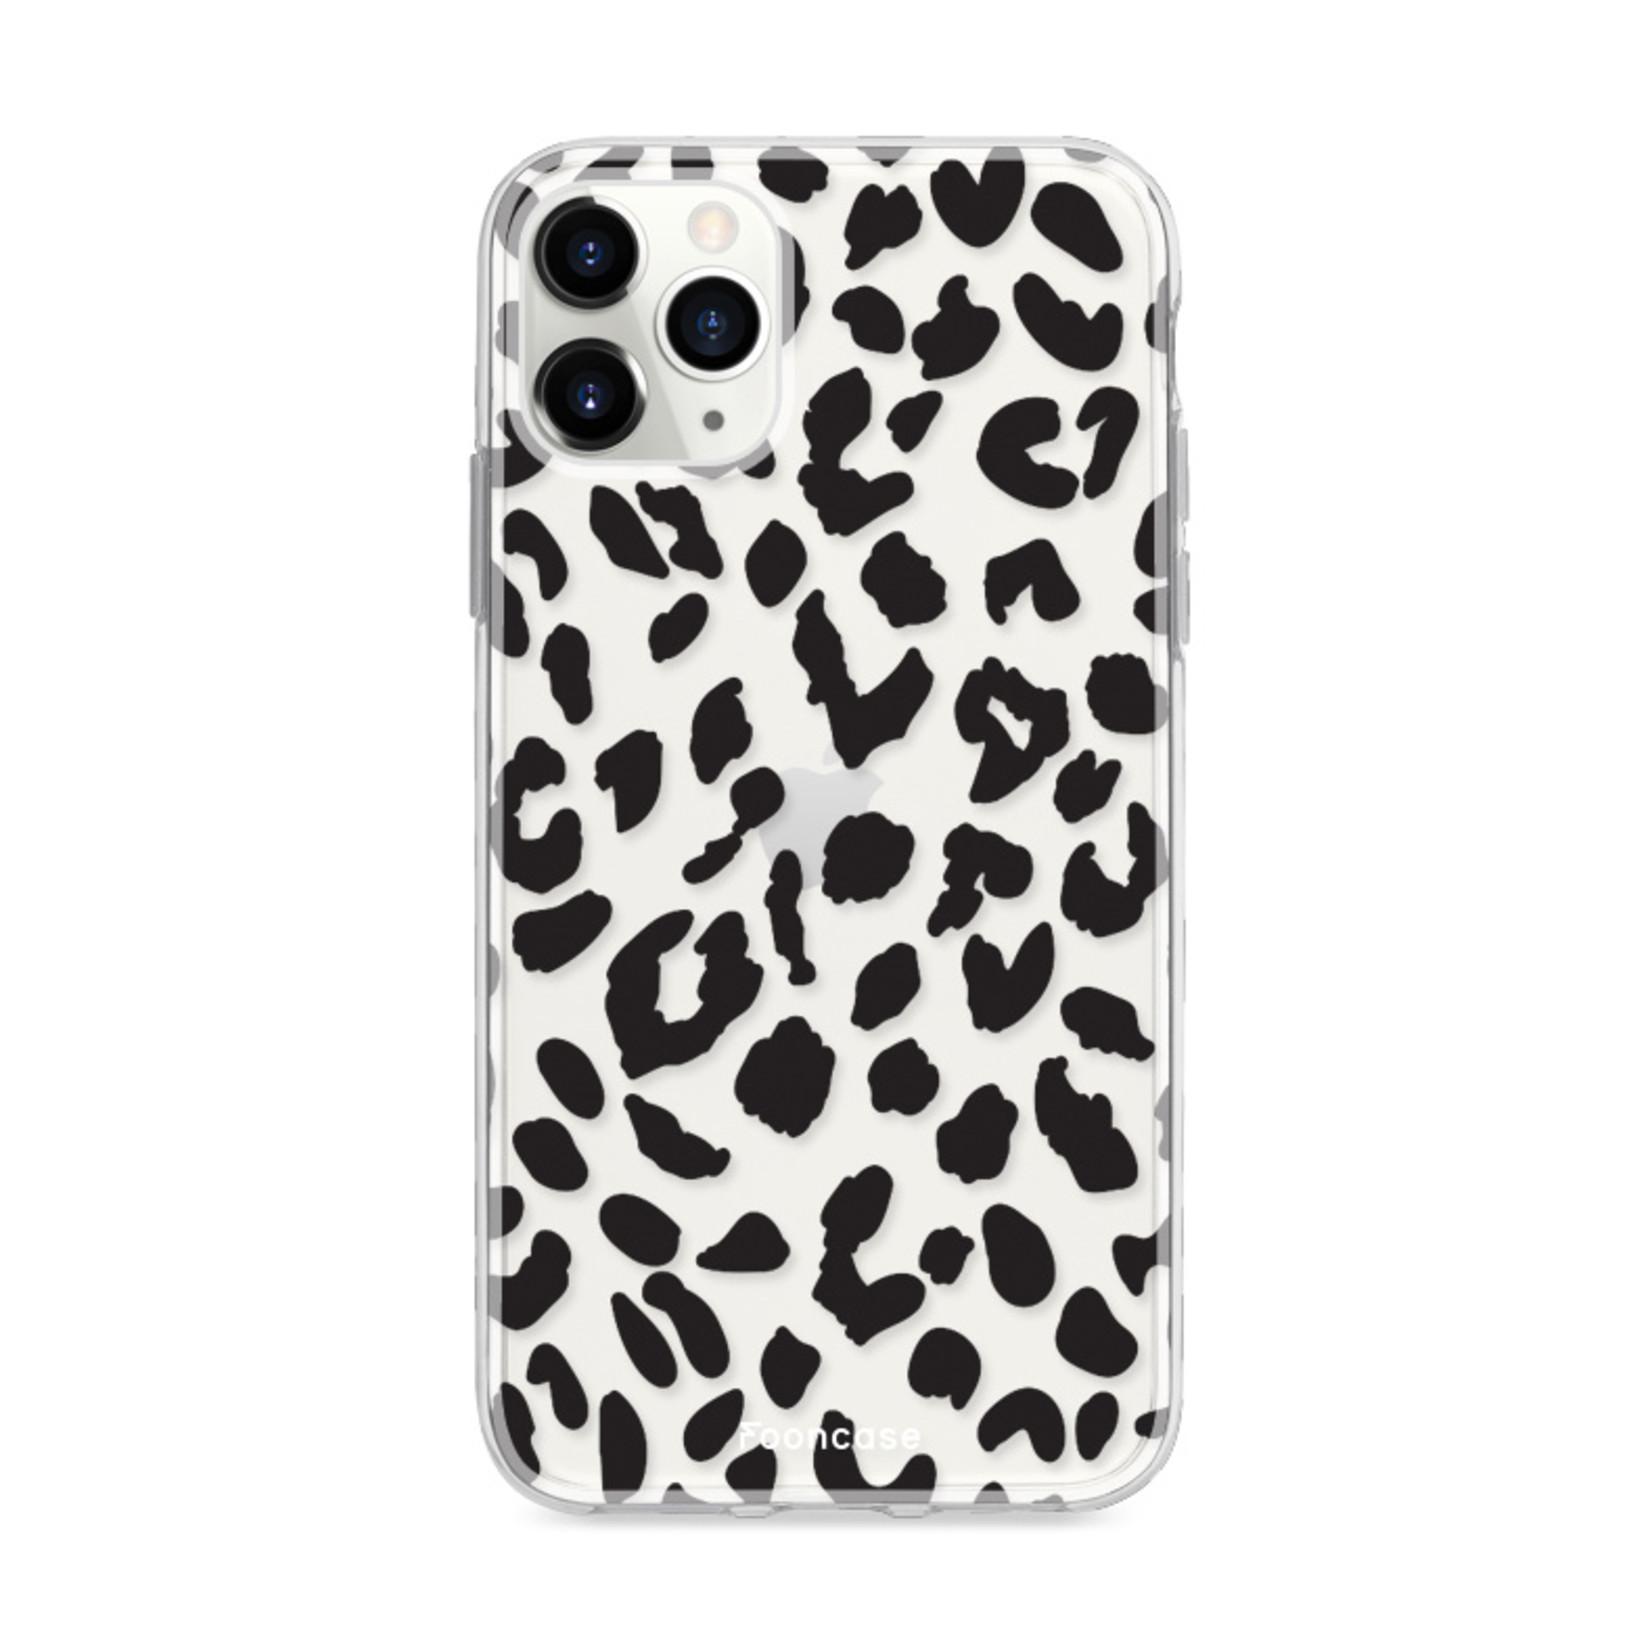 FOONCASE iPhone 12 Pro Max hoesje TPU Soft Case - Back Cover - Luipaard / Leopard print